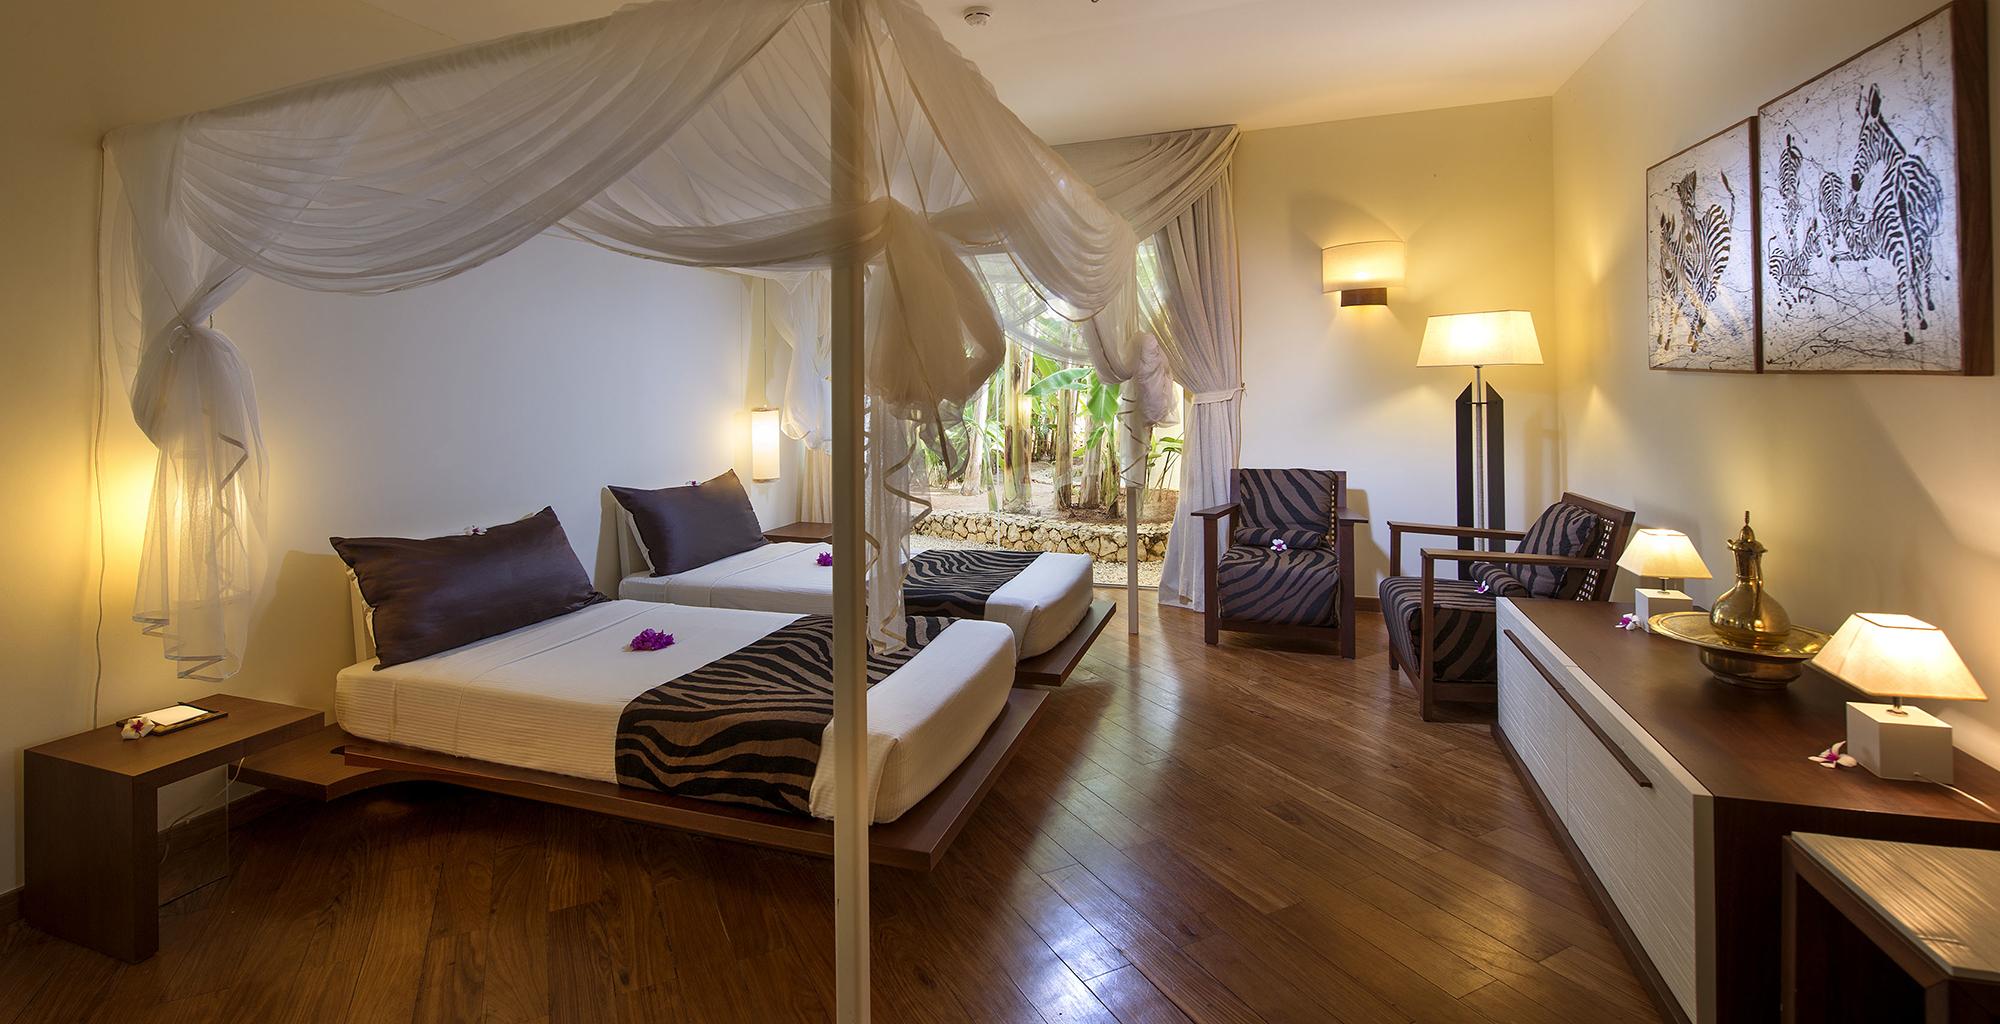 Tanzania-Star-of-the-East-Twin-Room